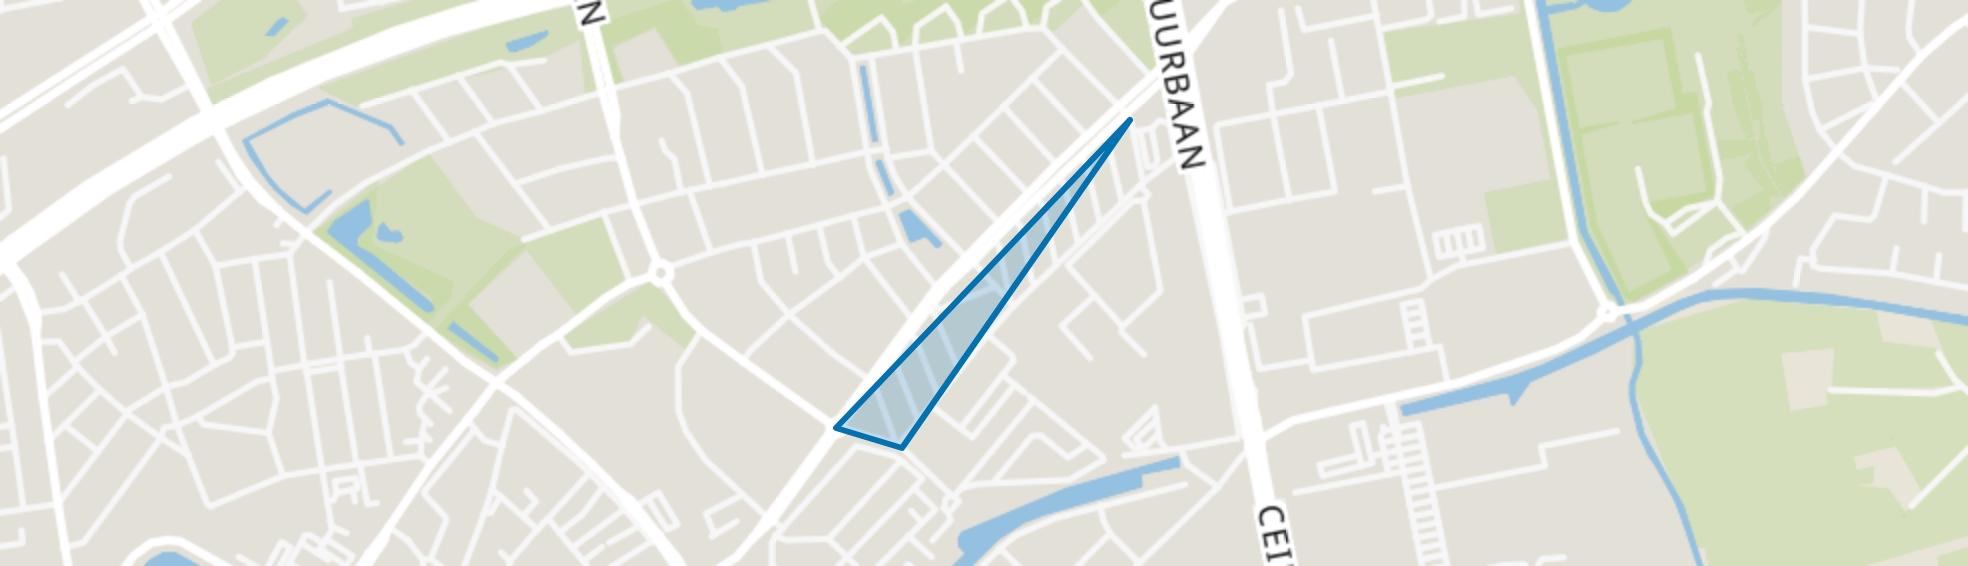 Meppelerstraatweg-Zuid, Zwolle map